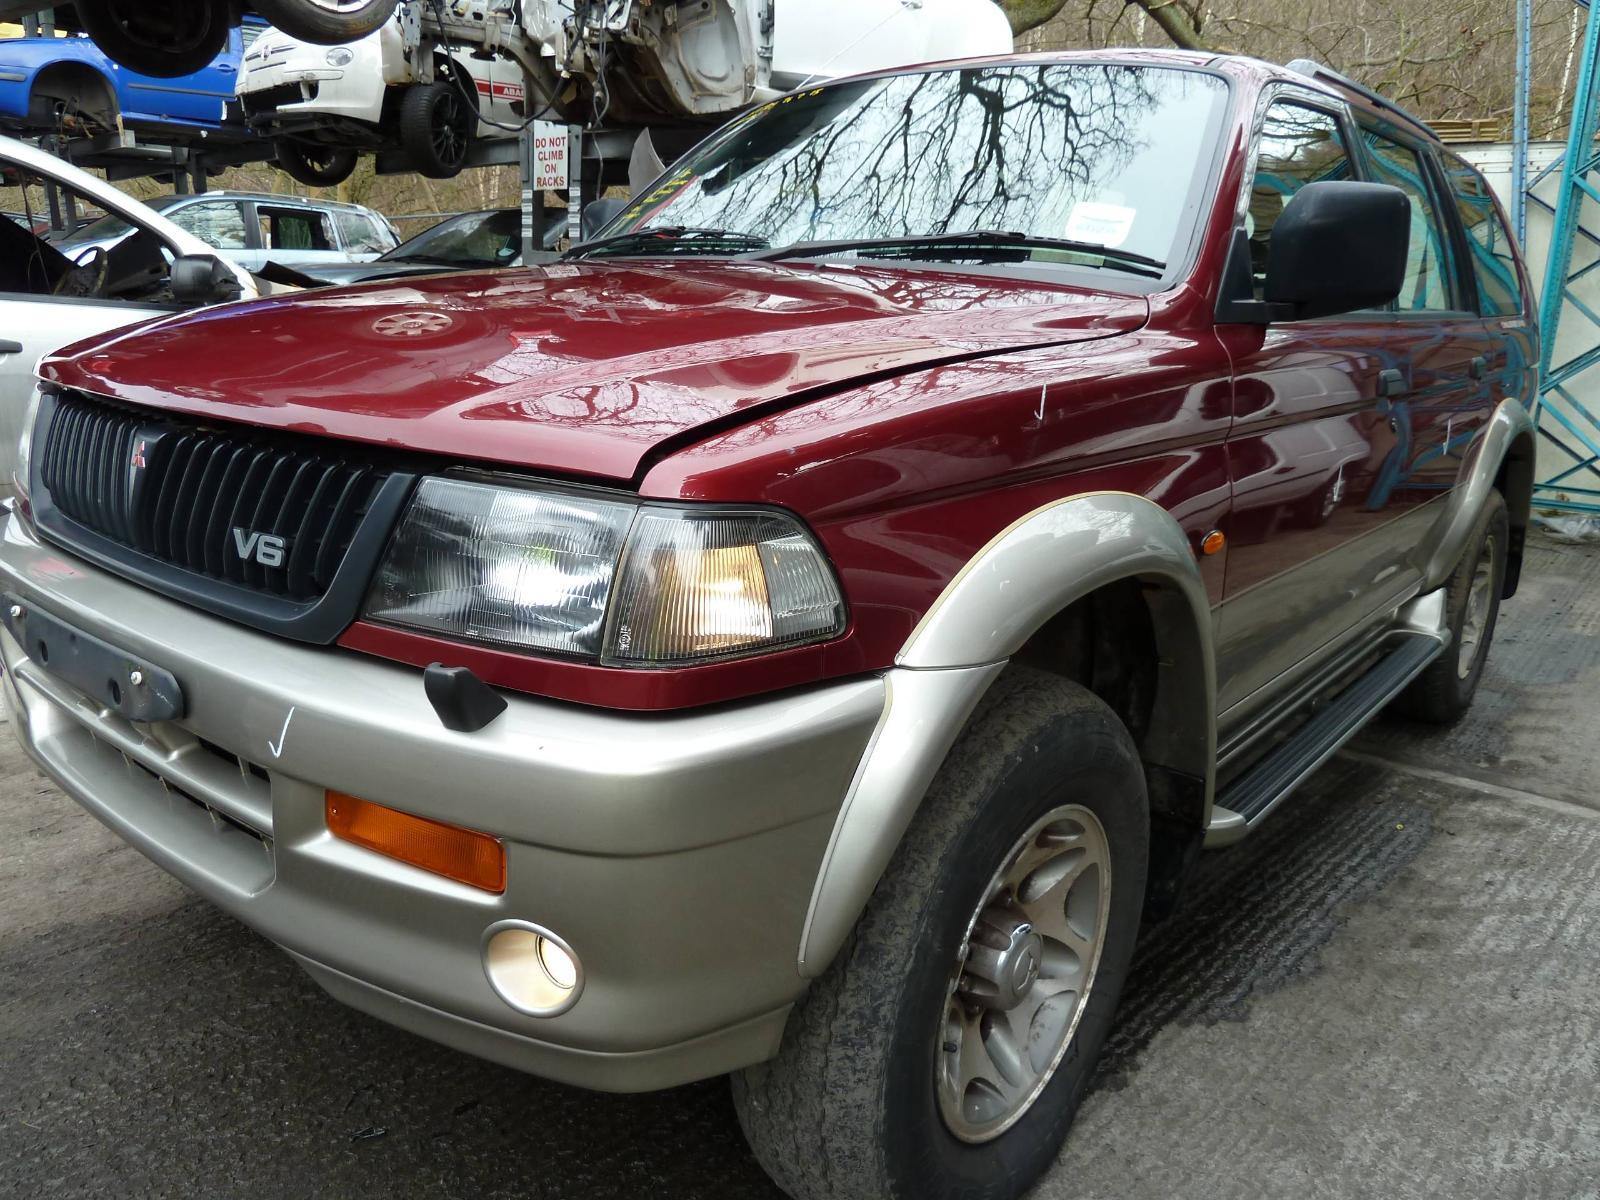 Image for a MITSUBISHI CHALLENGER/SHOGUN SPORT 1999 5 Door Hatchback